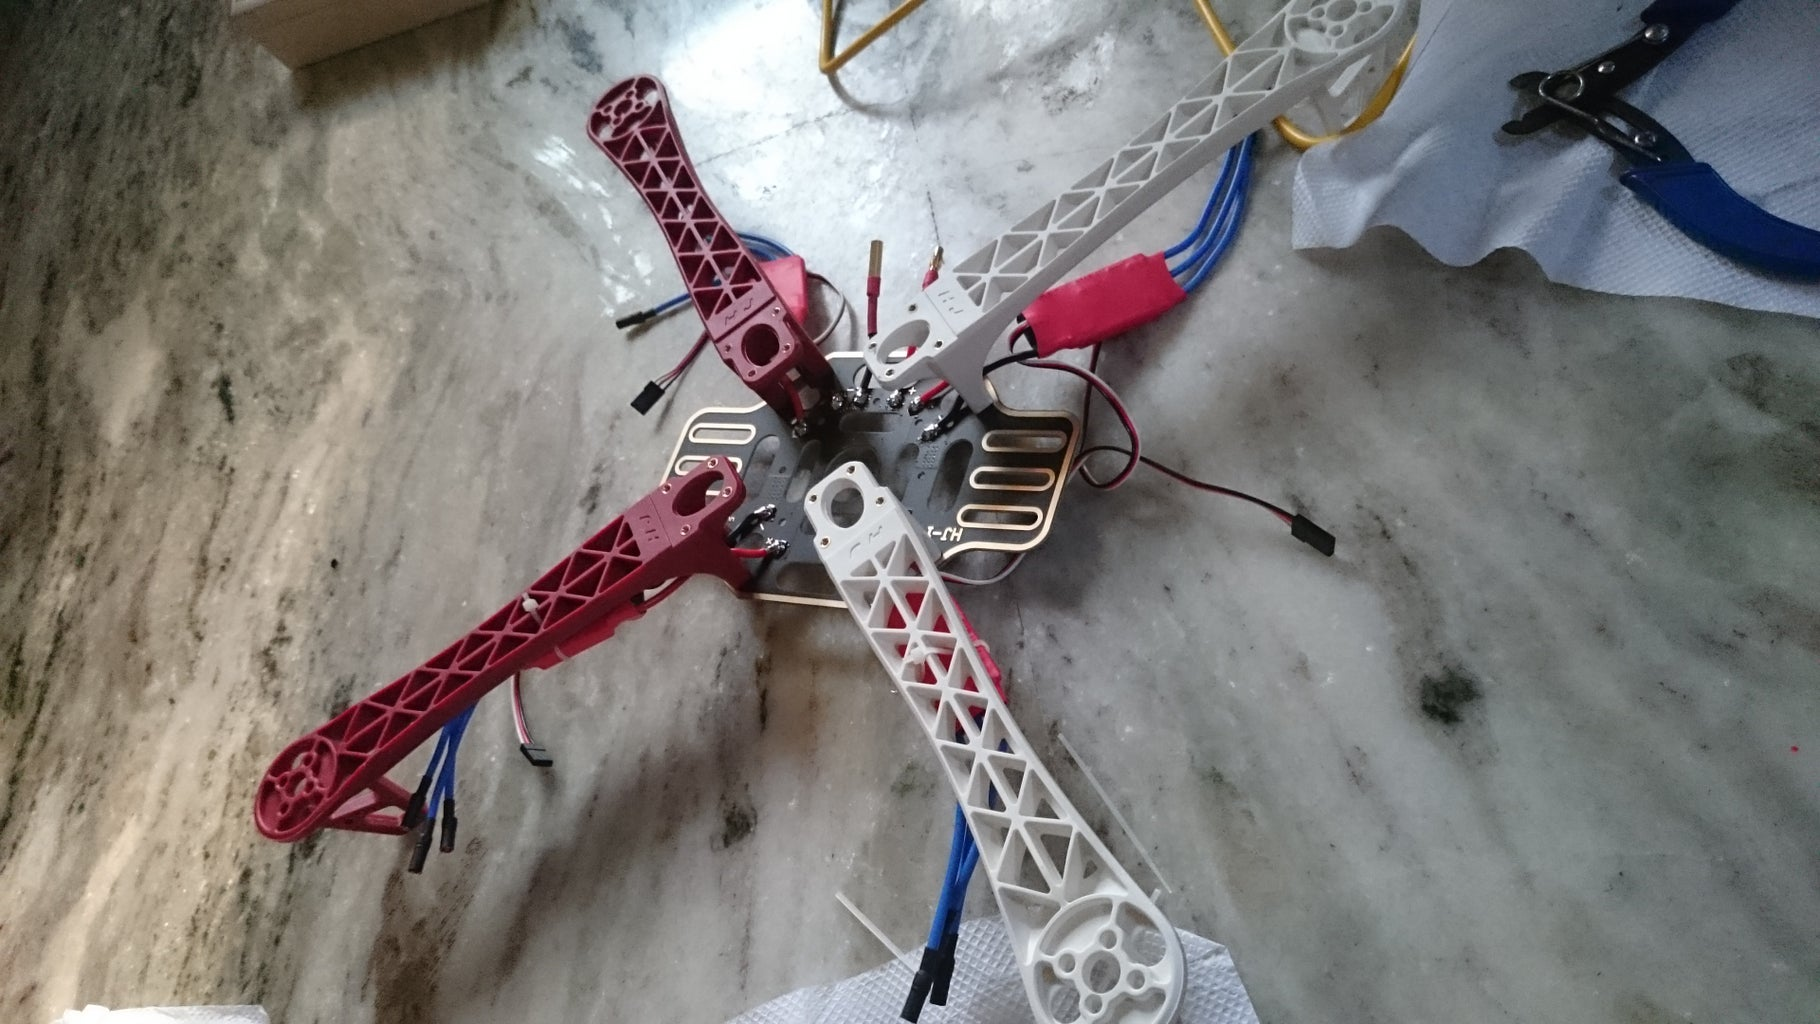 DJi F450 Quadcopter How to Build? Home Built.